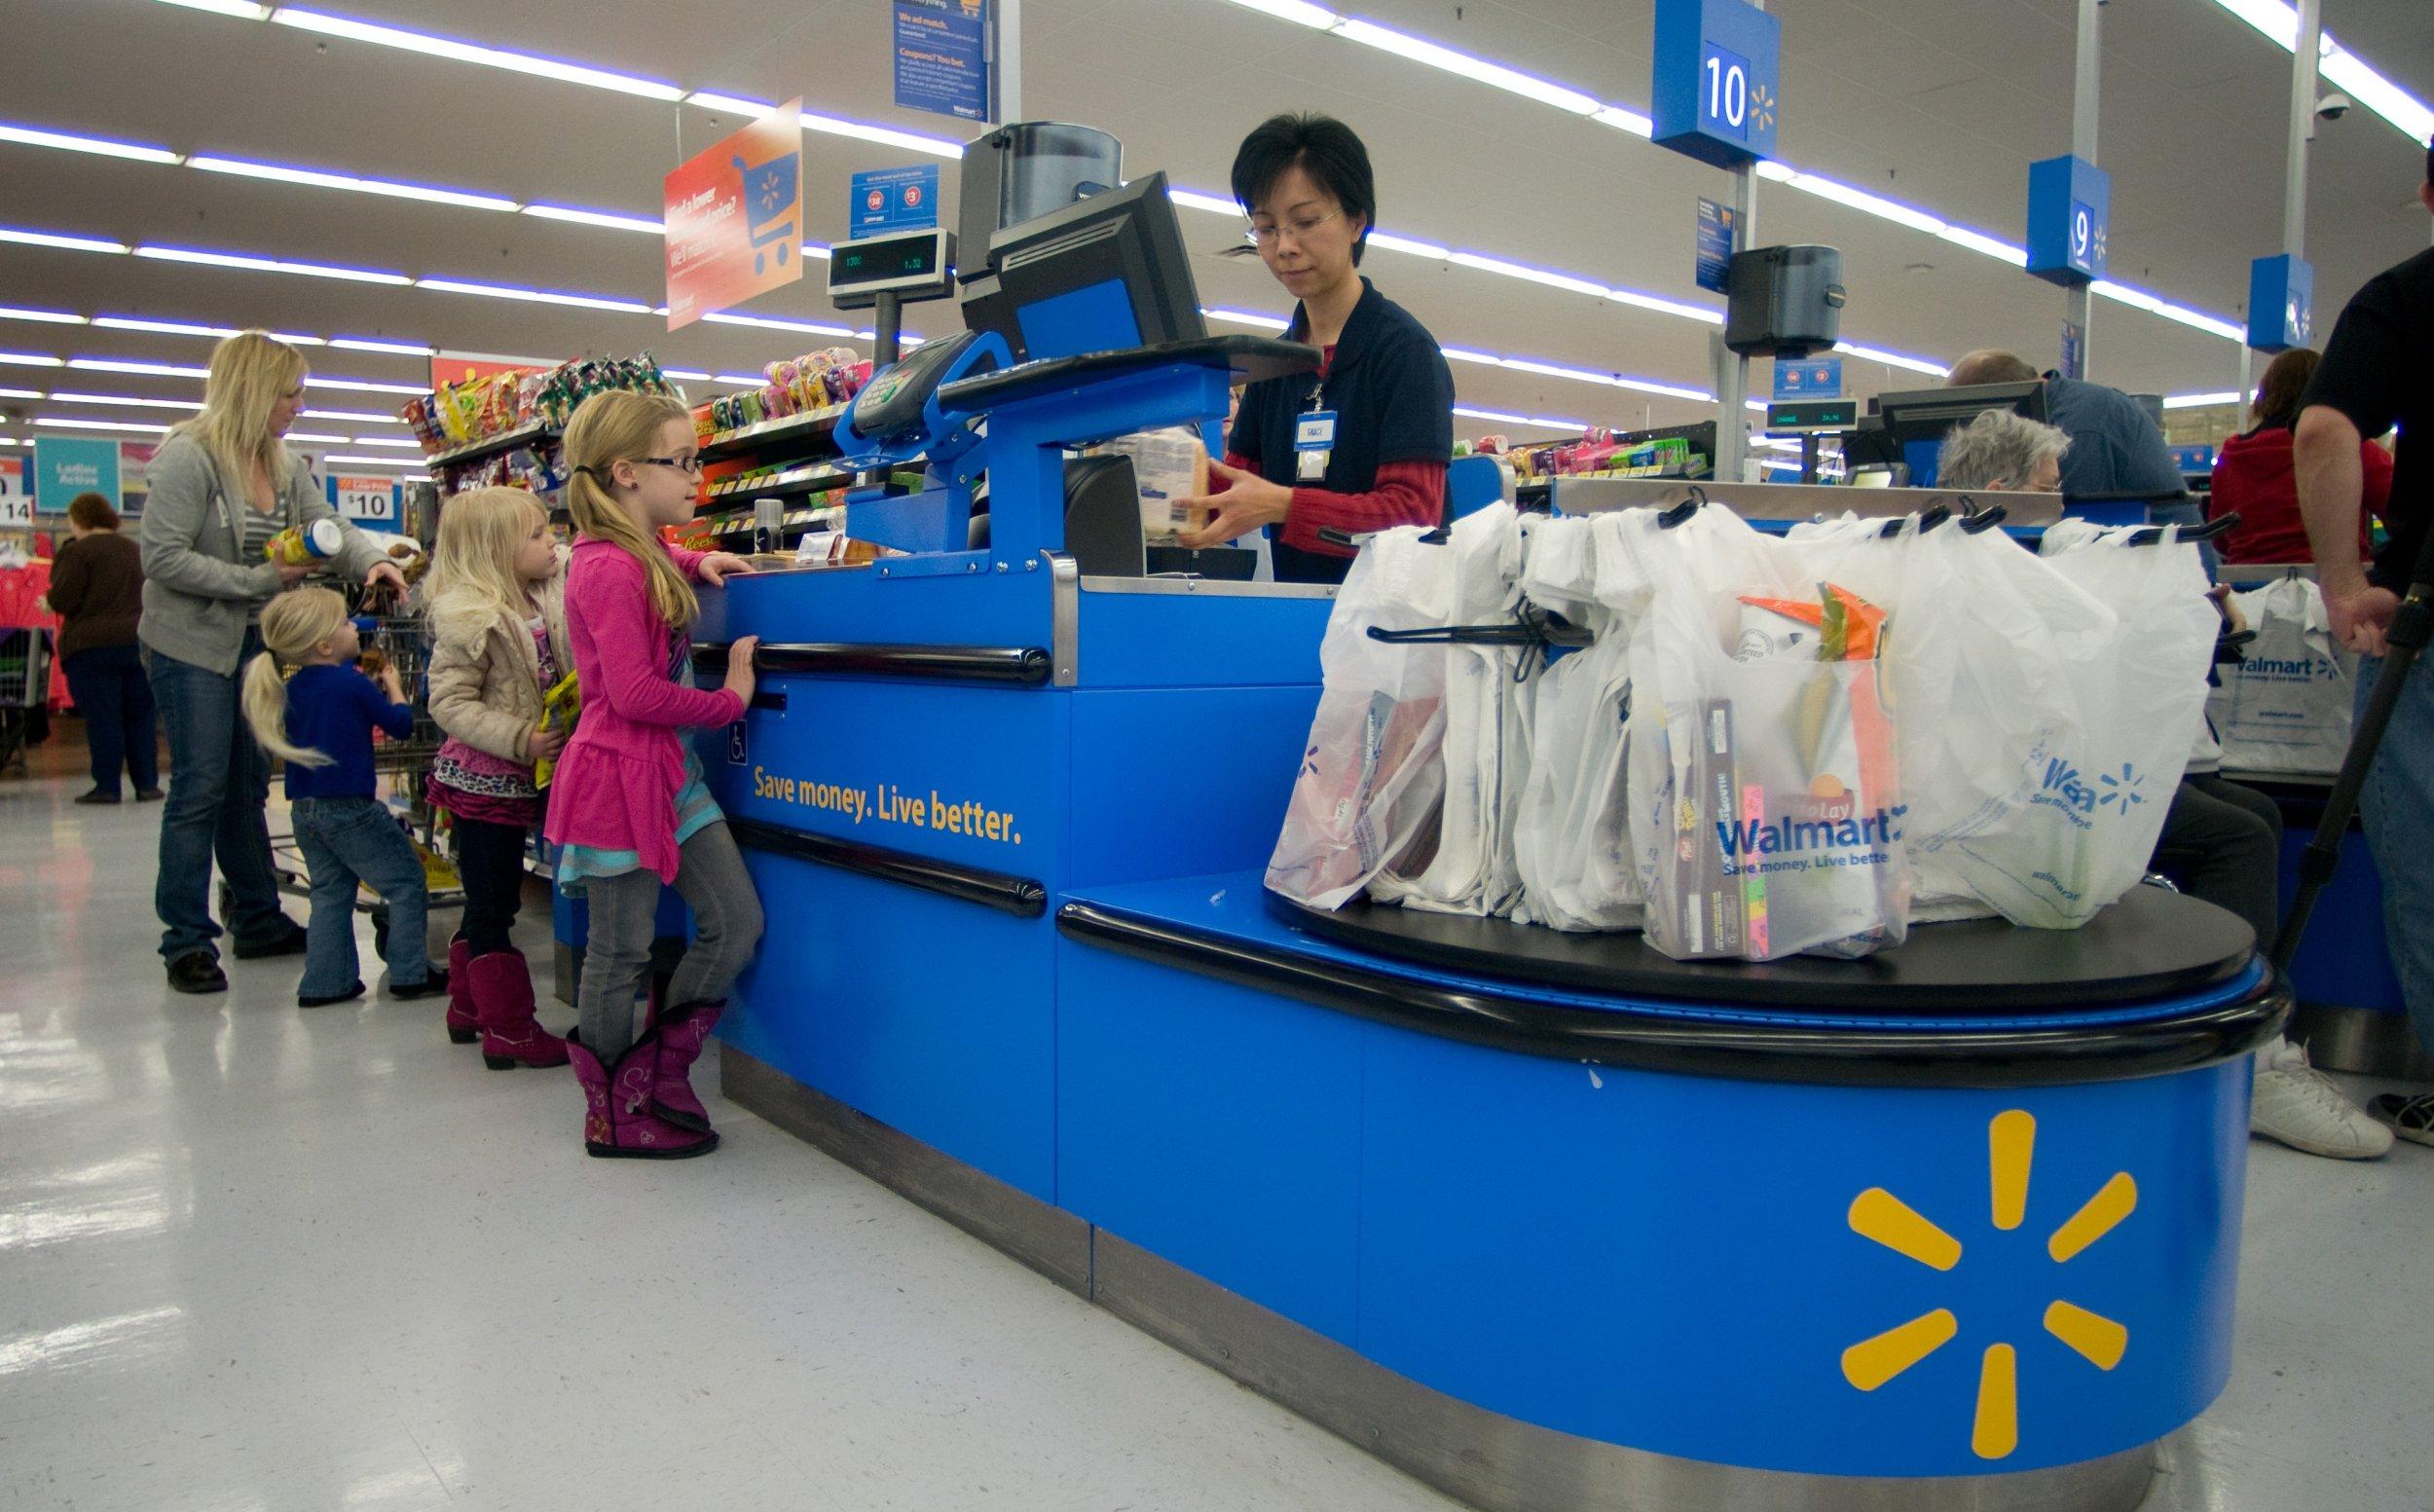 10-6-14 Walmart 2